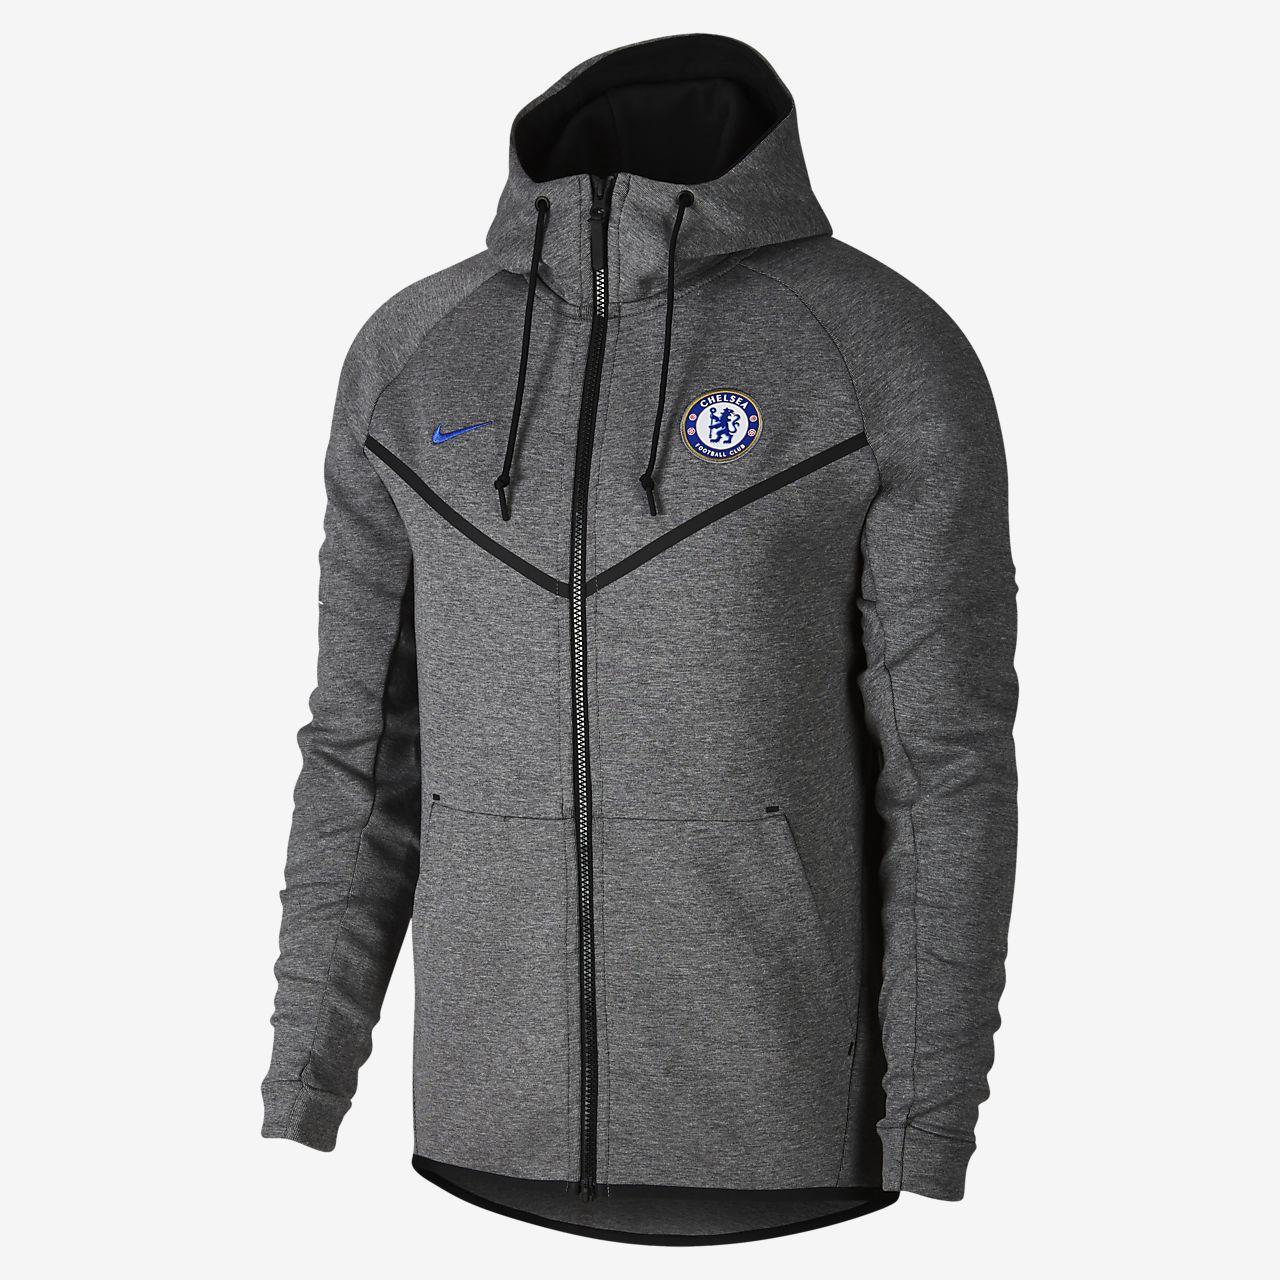 ddb9577e505b Chelsea FC Tech Fleece Windrunner Men s Hoodie. Nike.com BE